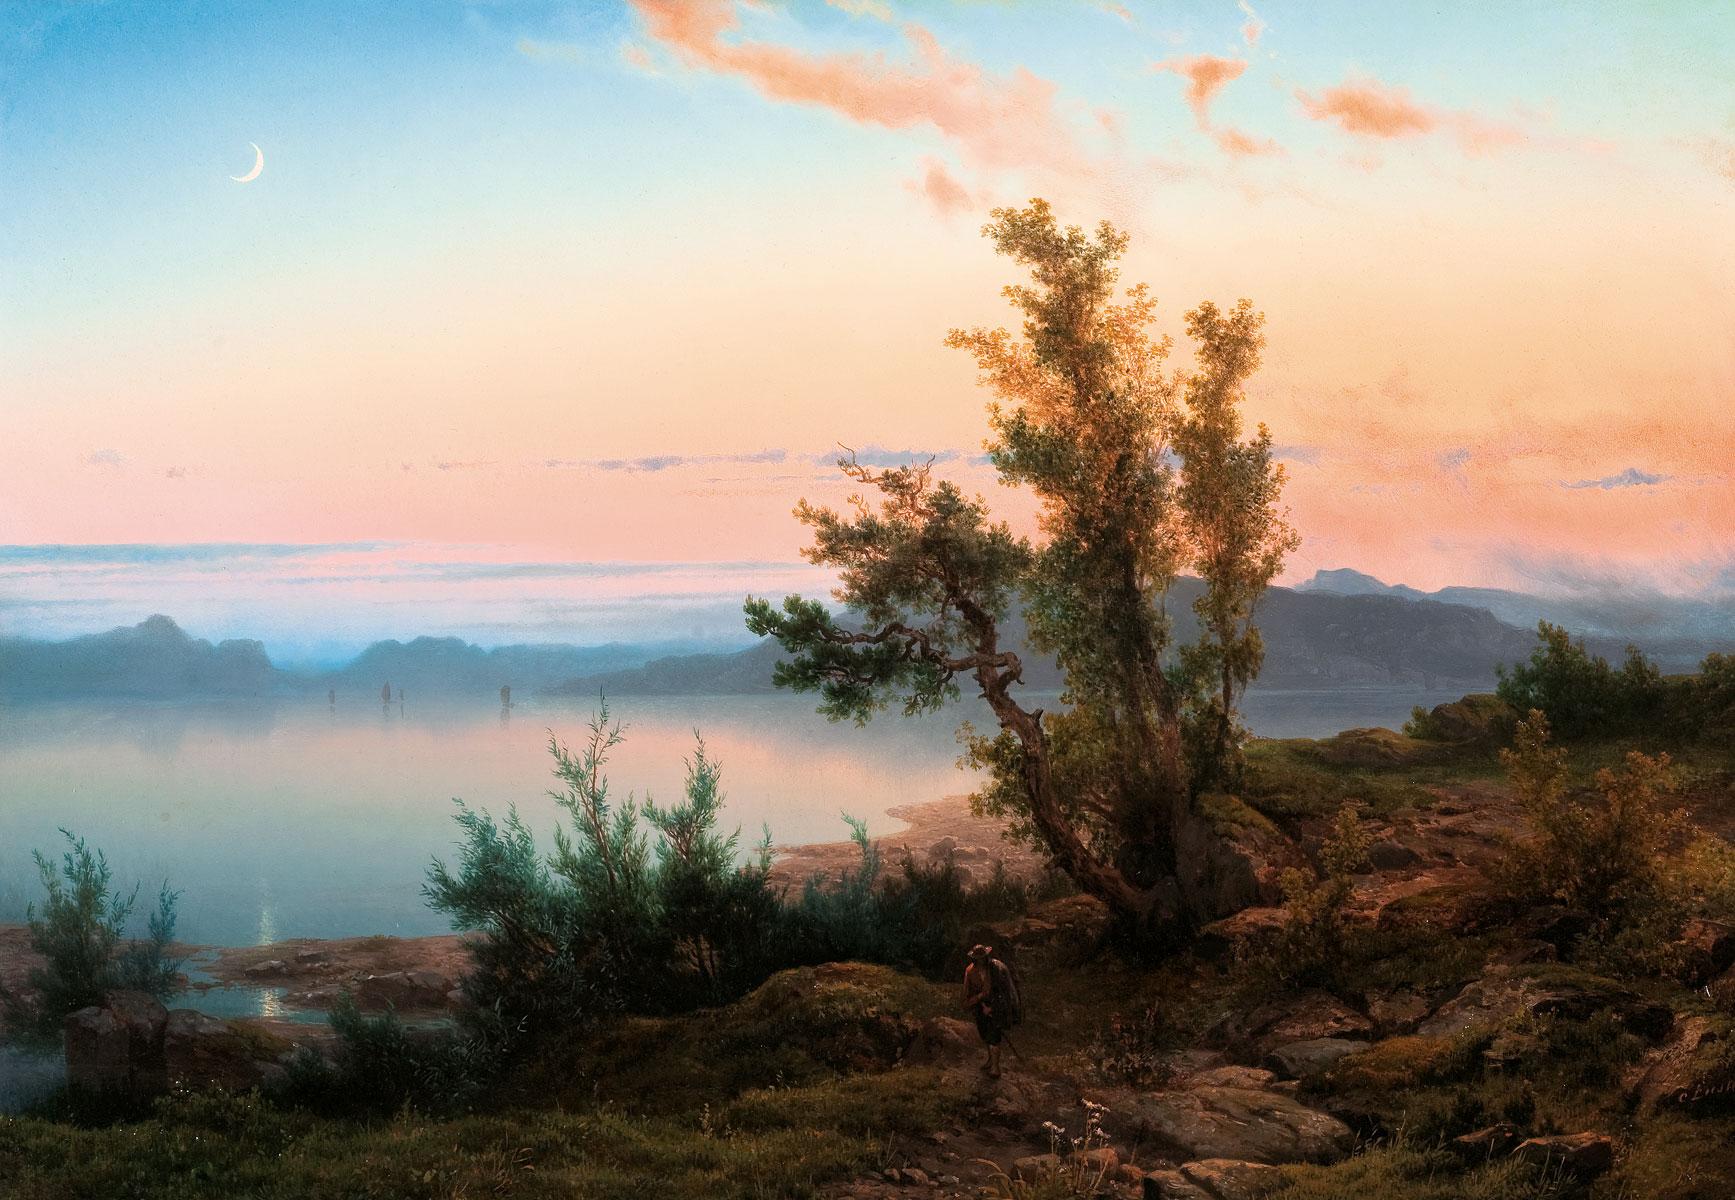 Cornelis Lieste, Abendlandschaft mit Bergsee und Mondsichel, ca. 1853–1861, 54,8×78,5 cm; B.C. Koekkoek-Haus Kleve © B. C. Koekkoek-Haus Kleve / Foto: Erno Kiljan